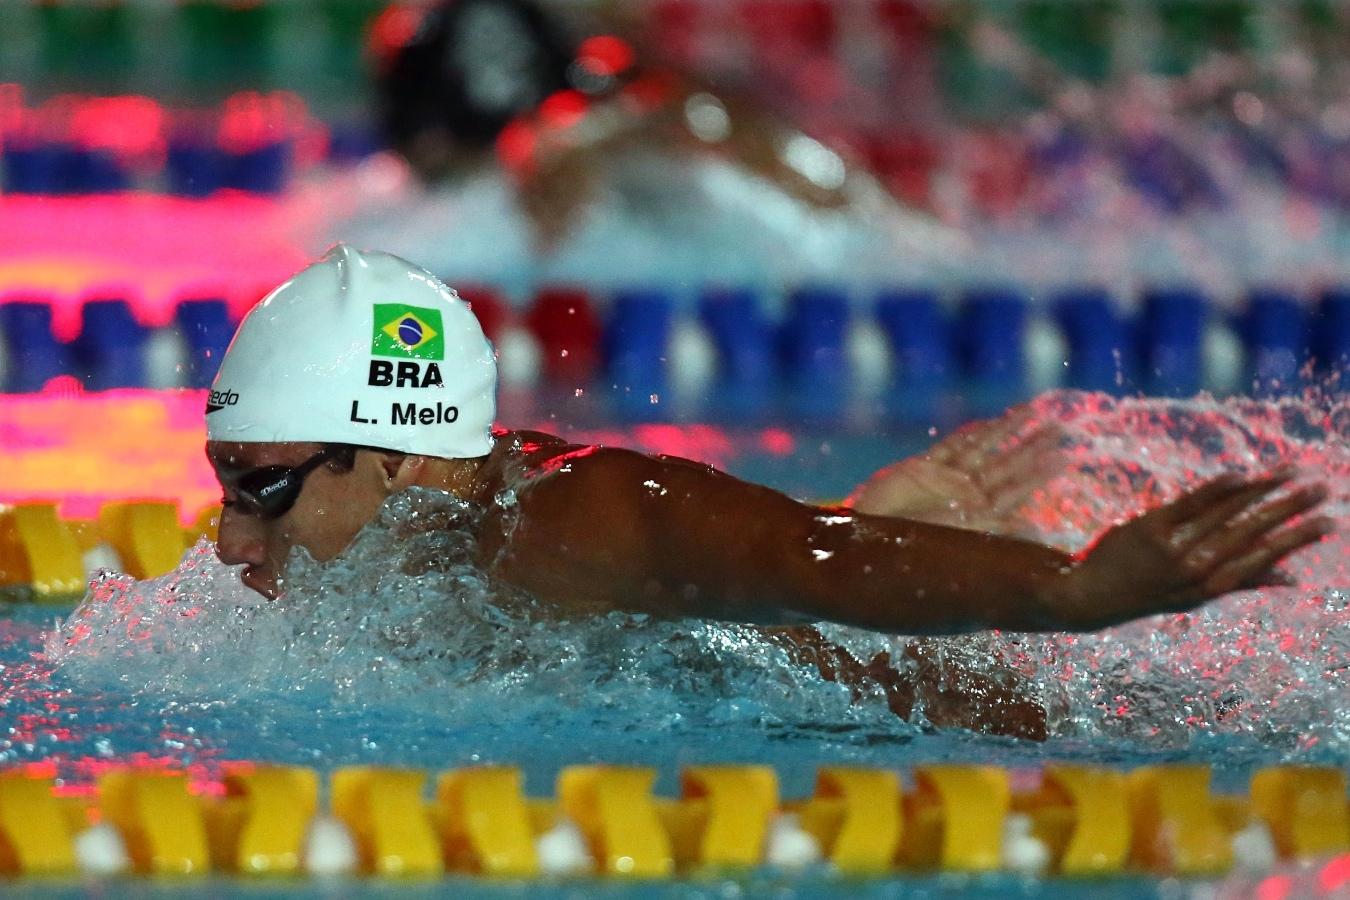 Luiz Altamir tentará também vaga nos 200 metros borboleta (Foto: Satiro Sodre/SSPress)